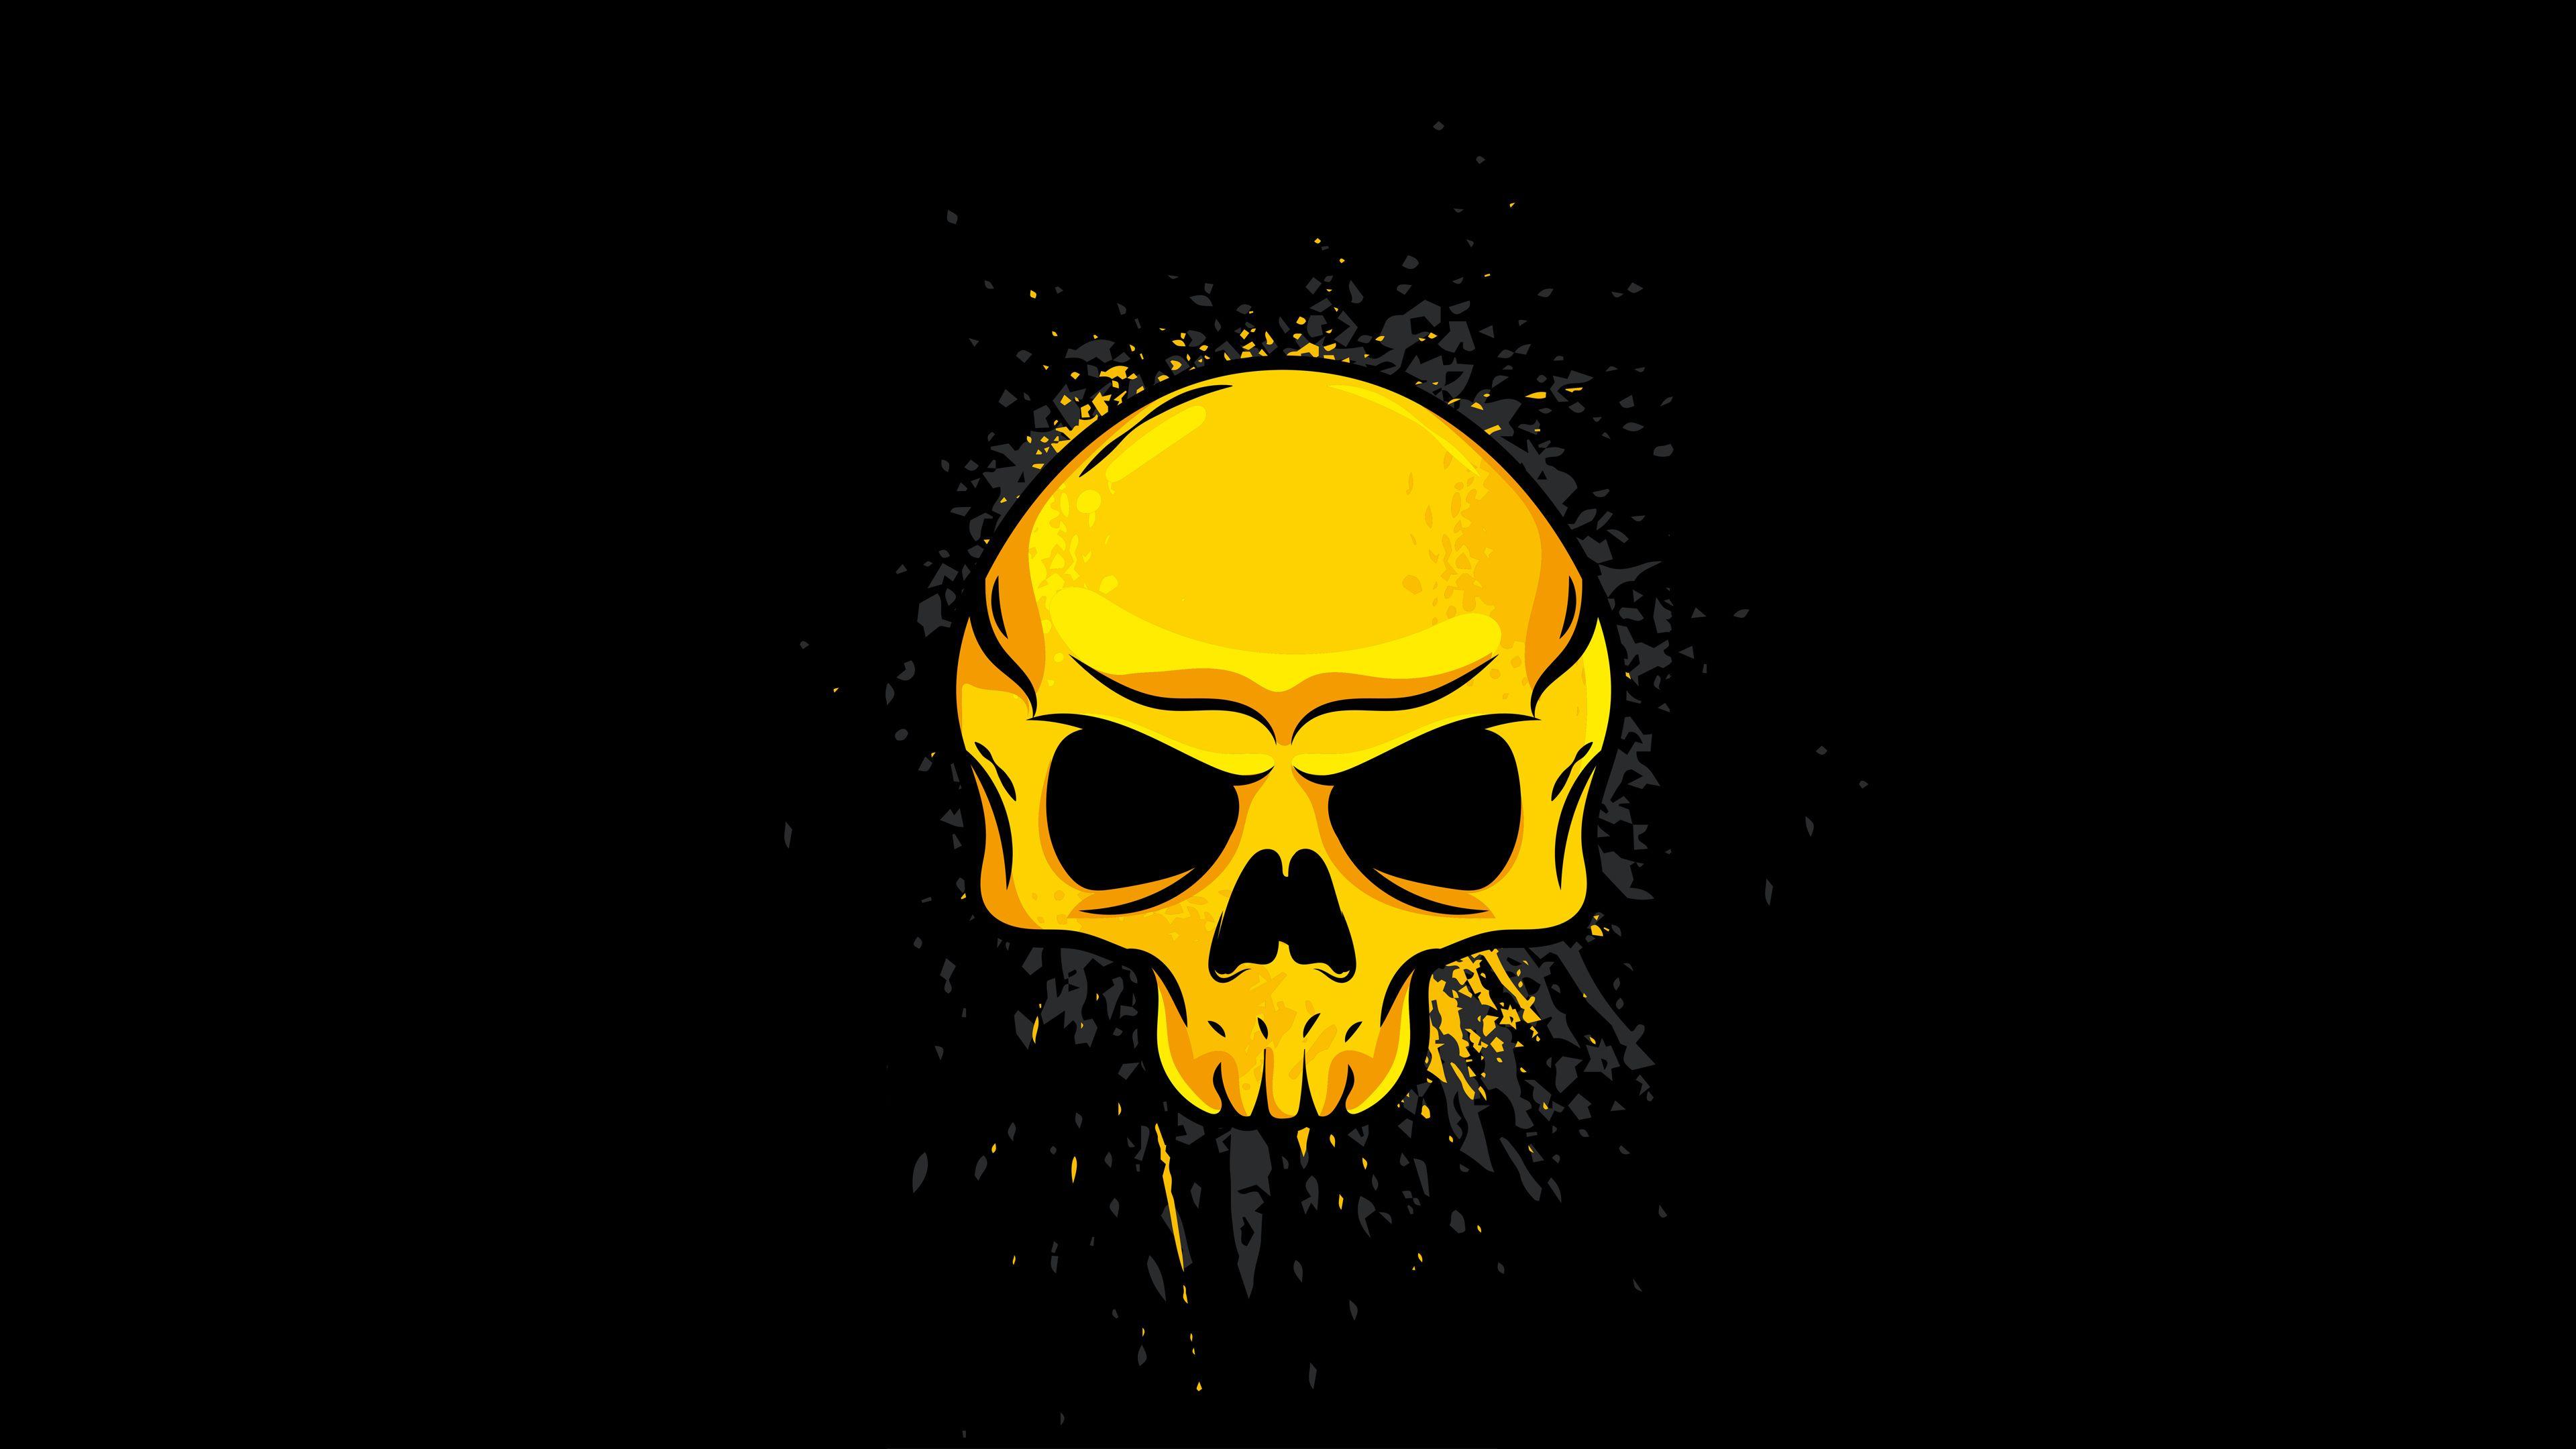 Golden Skull Wallpapers Wallpaper Cave